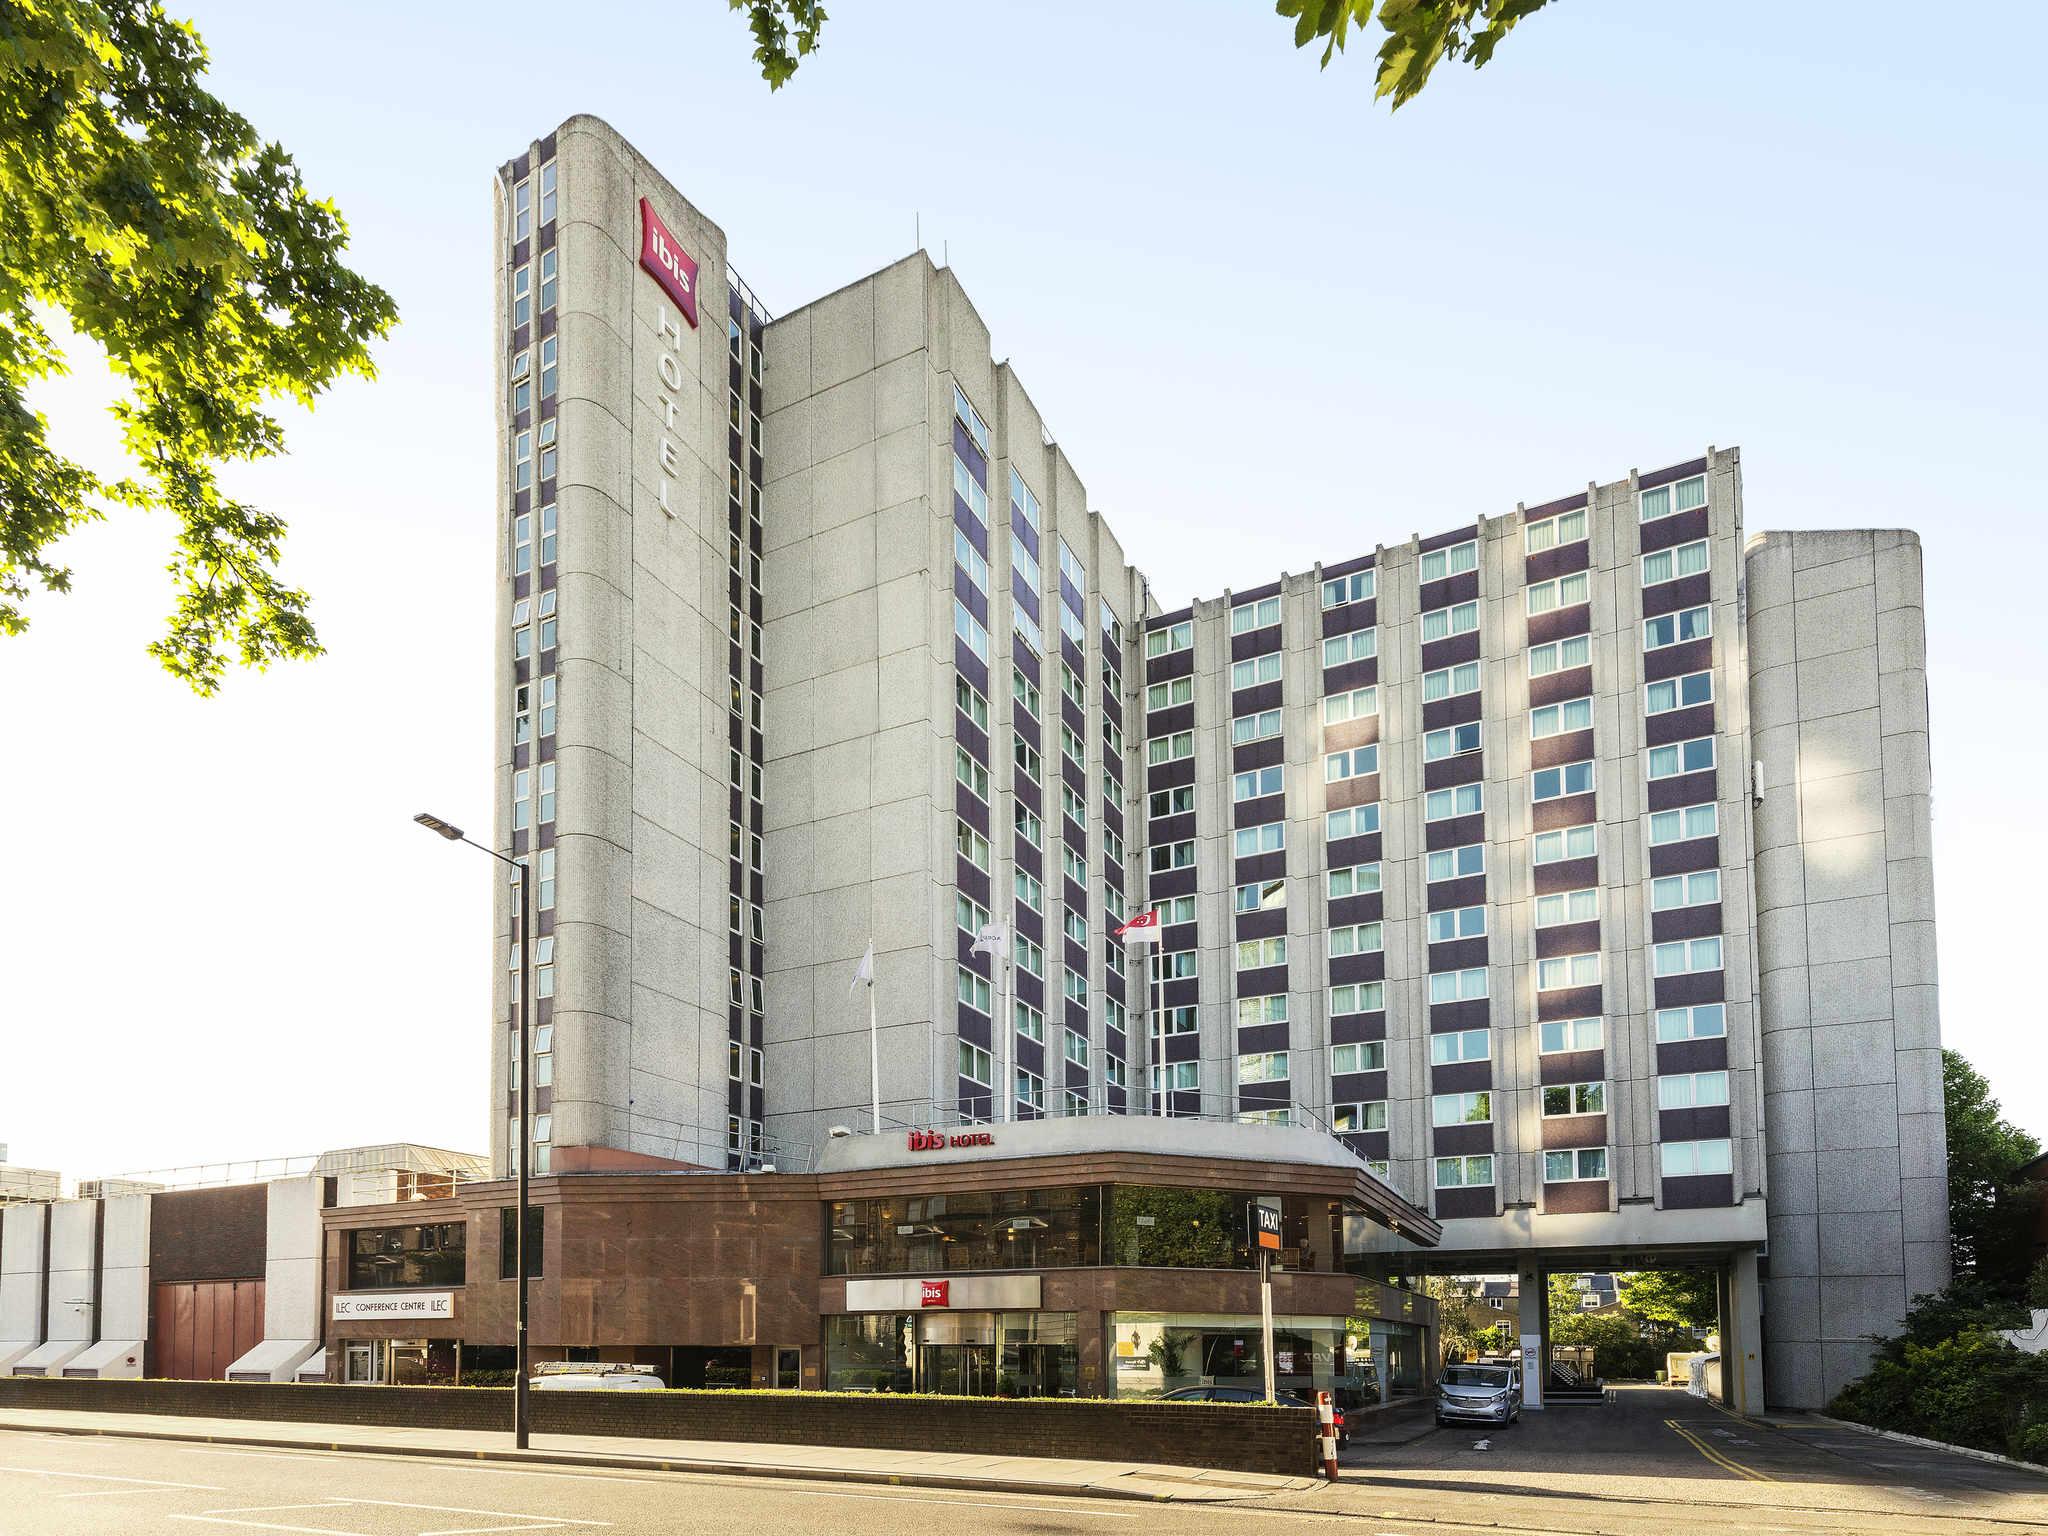 Hotell – ibis London Earls Court